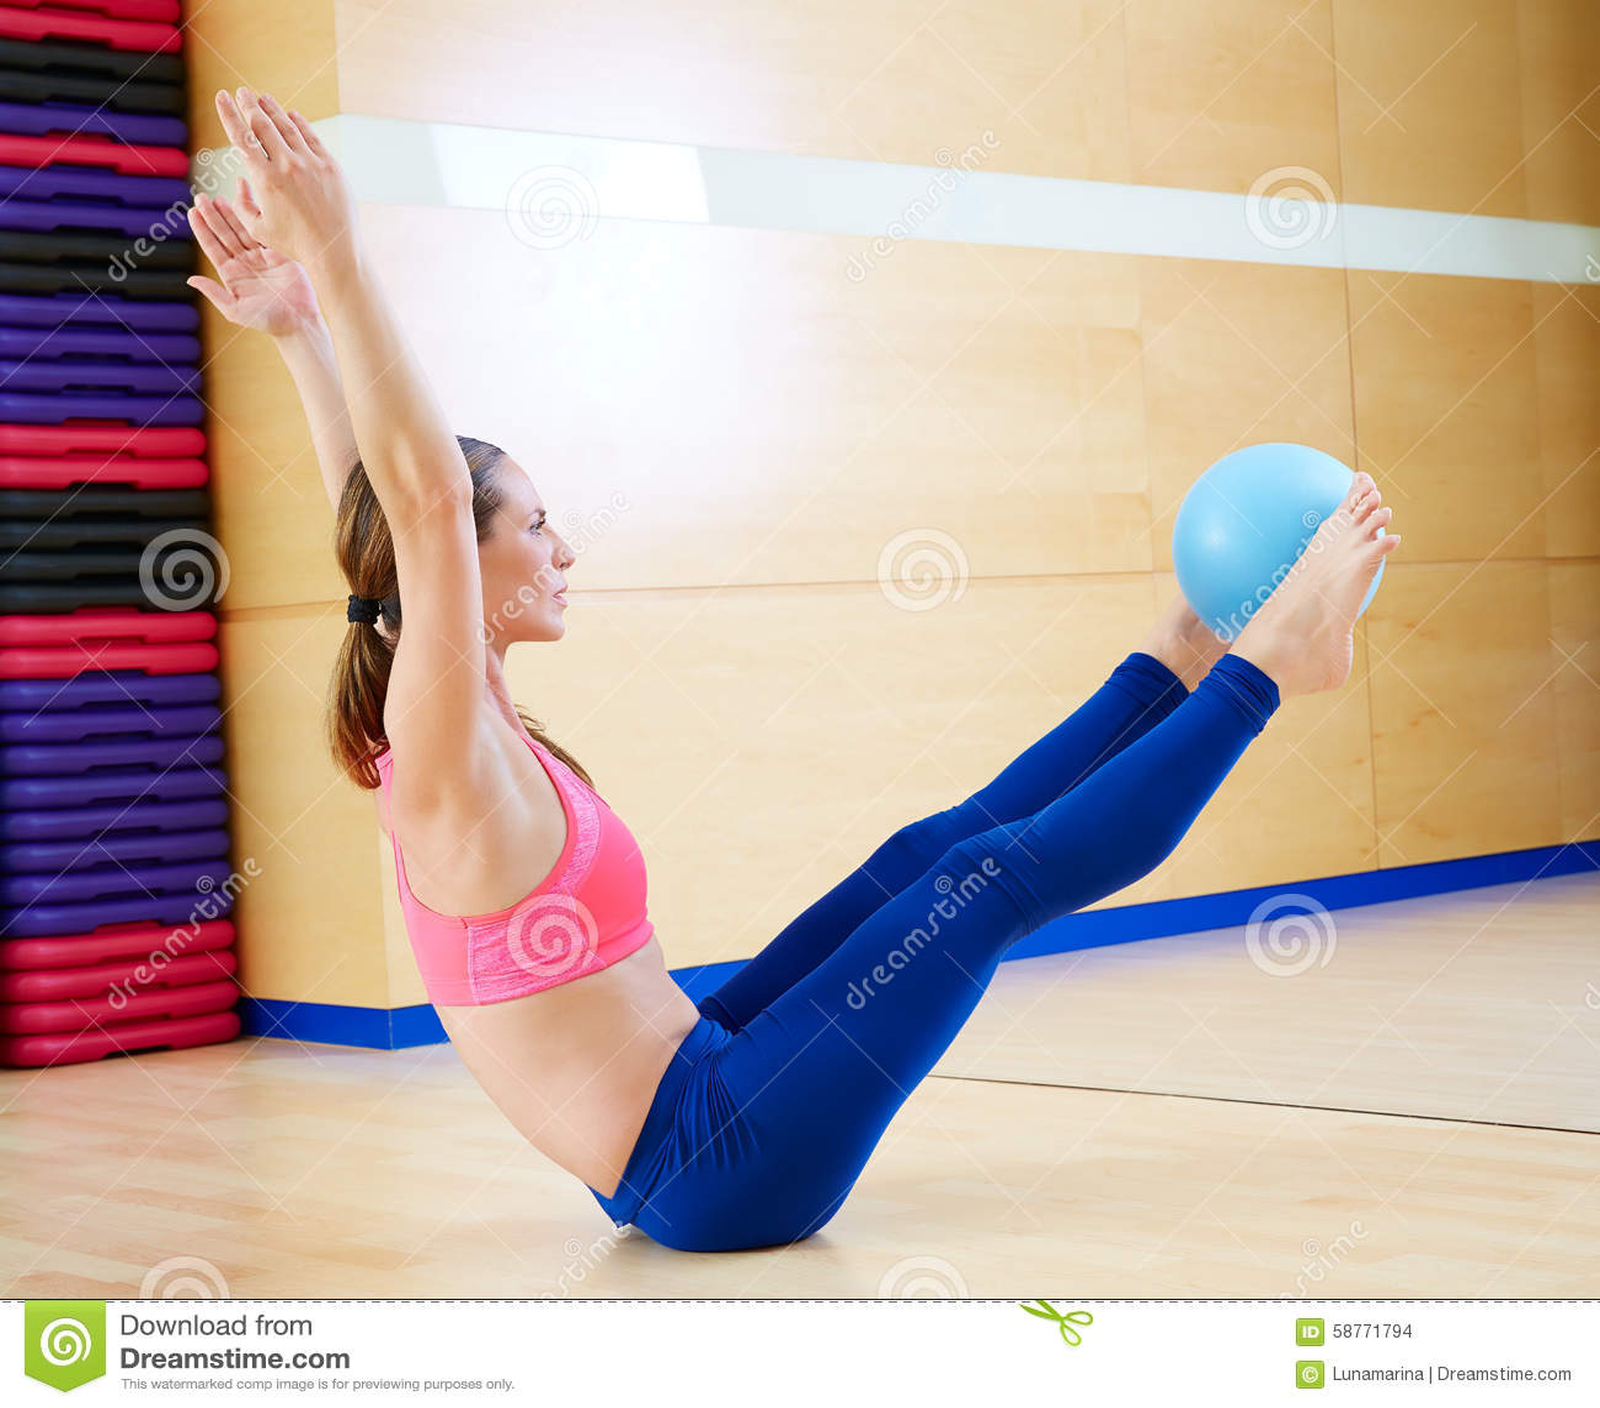 Woman Pilates Chair Exercises Fitness Stock Photo: Pilates Woman Stability Ball Teaser Exercise Stock Photo